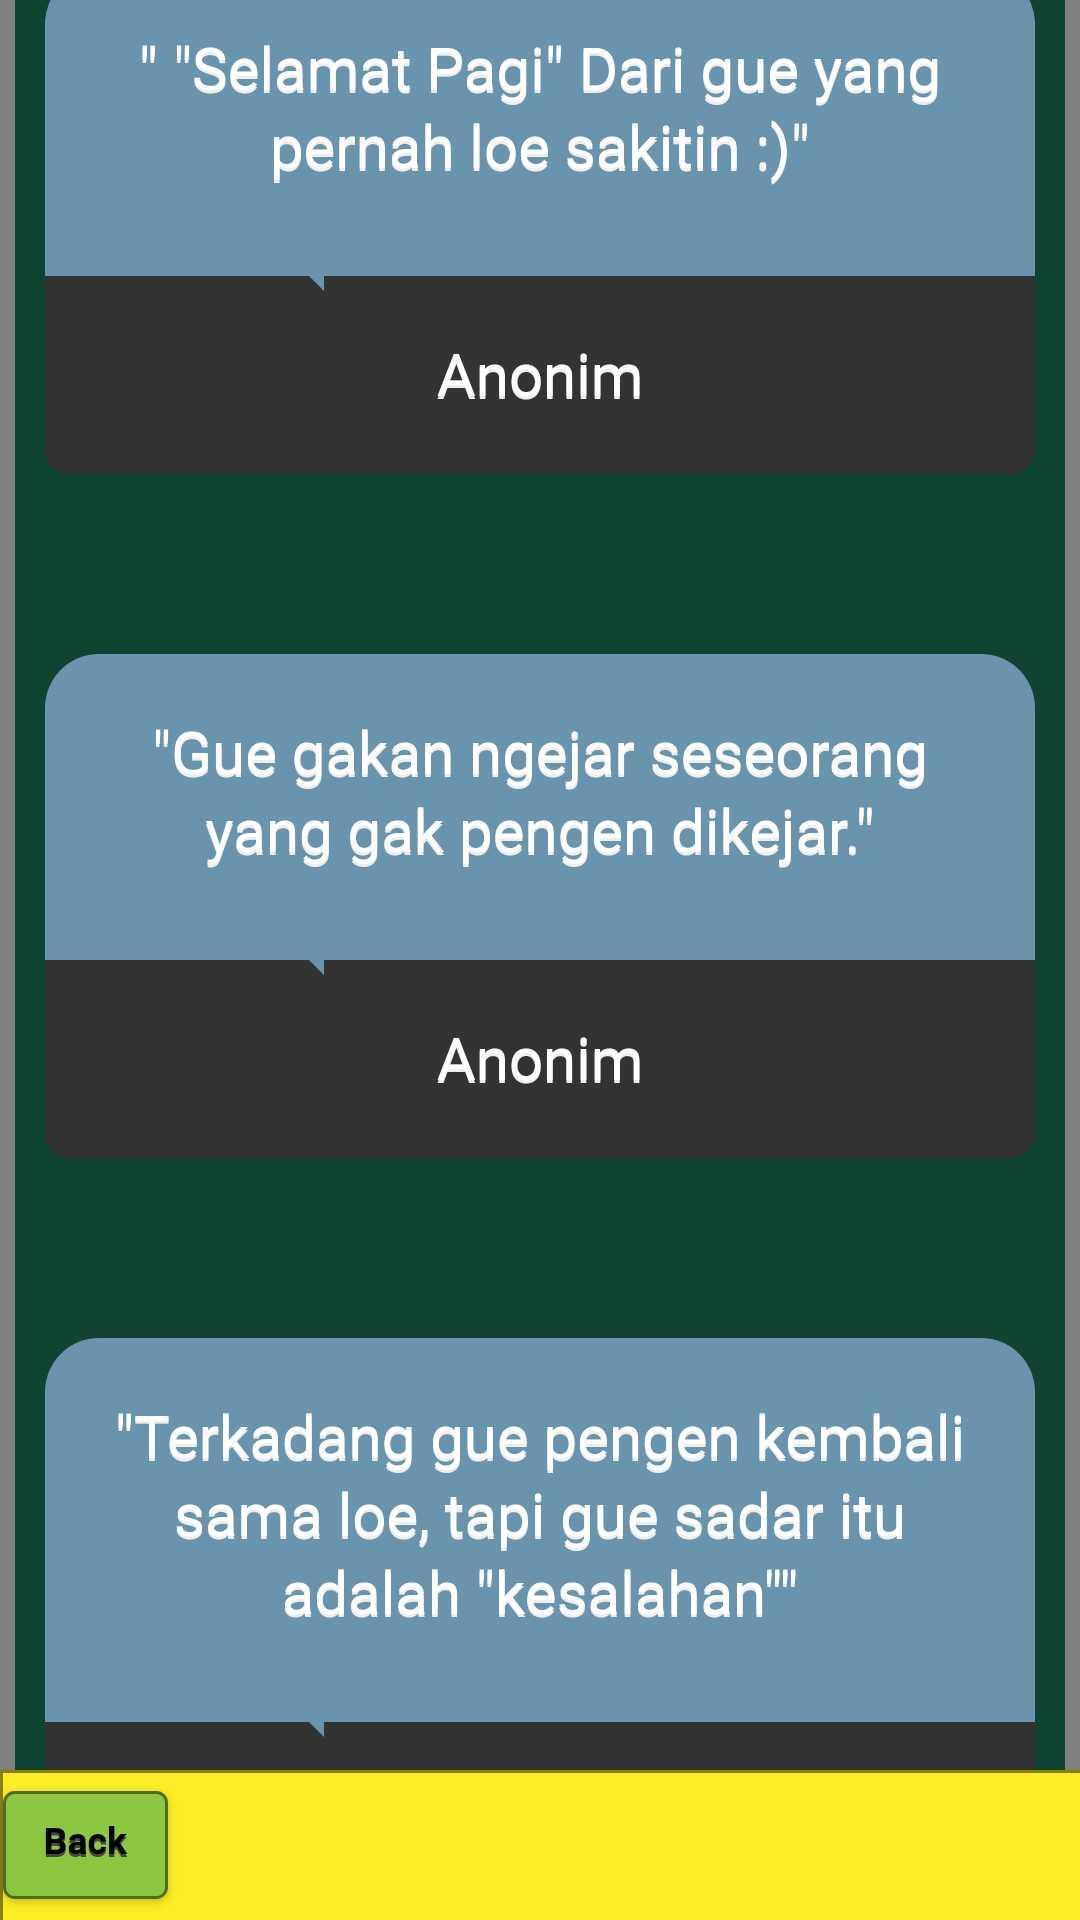 Kata Sindiran Buat Mantan Pacar Sombong For Android Apk